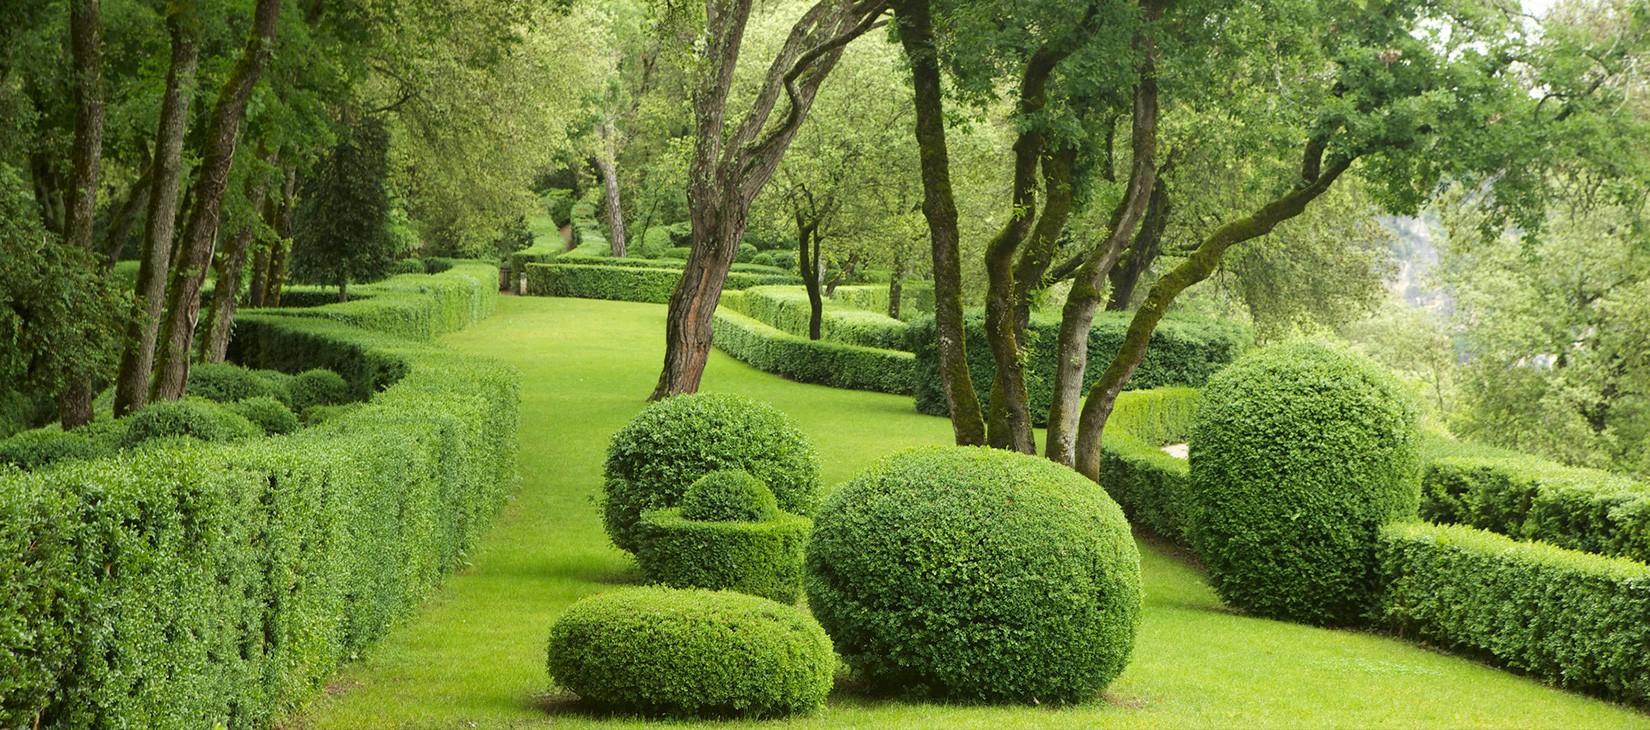 Accueil jardin jardinerie dalhem li ge - Le manuel des jardins agroecologiques ...